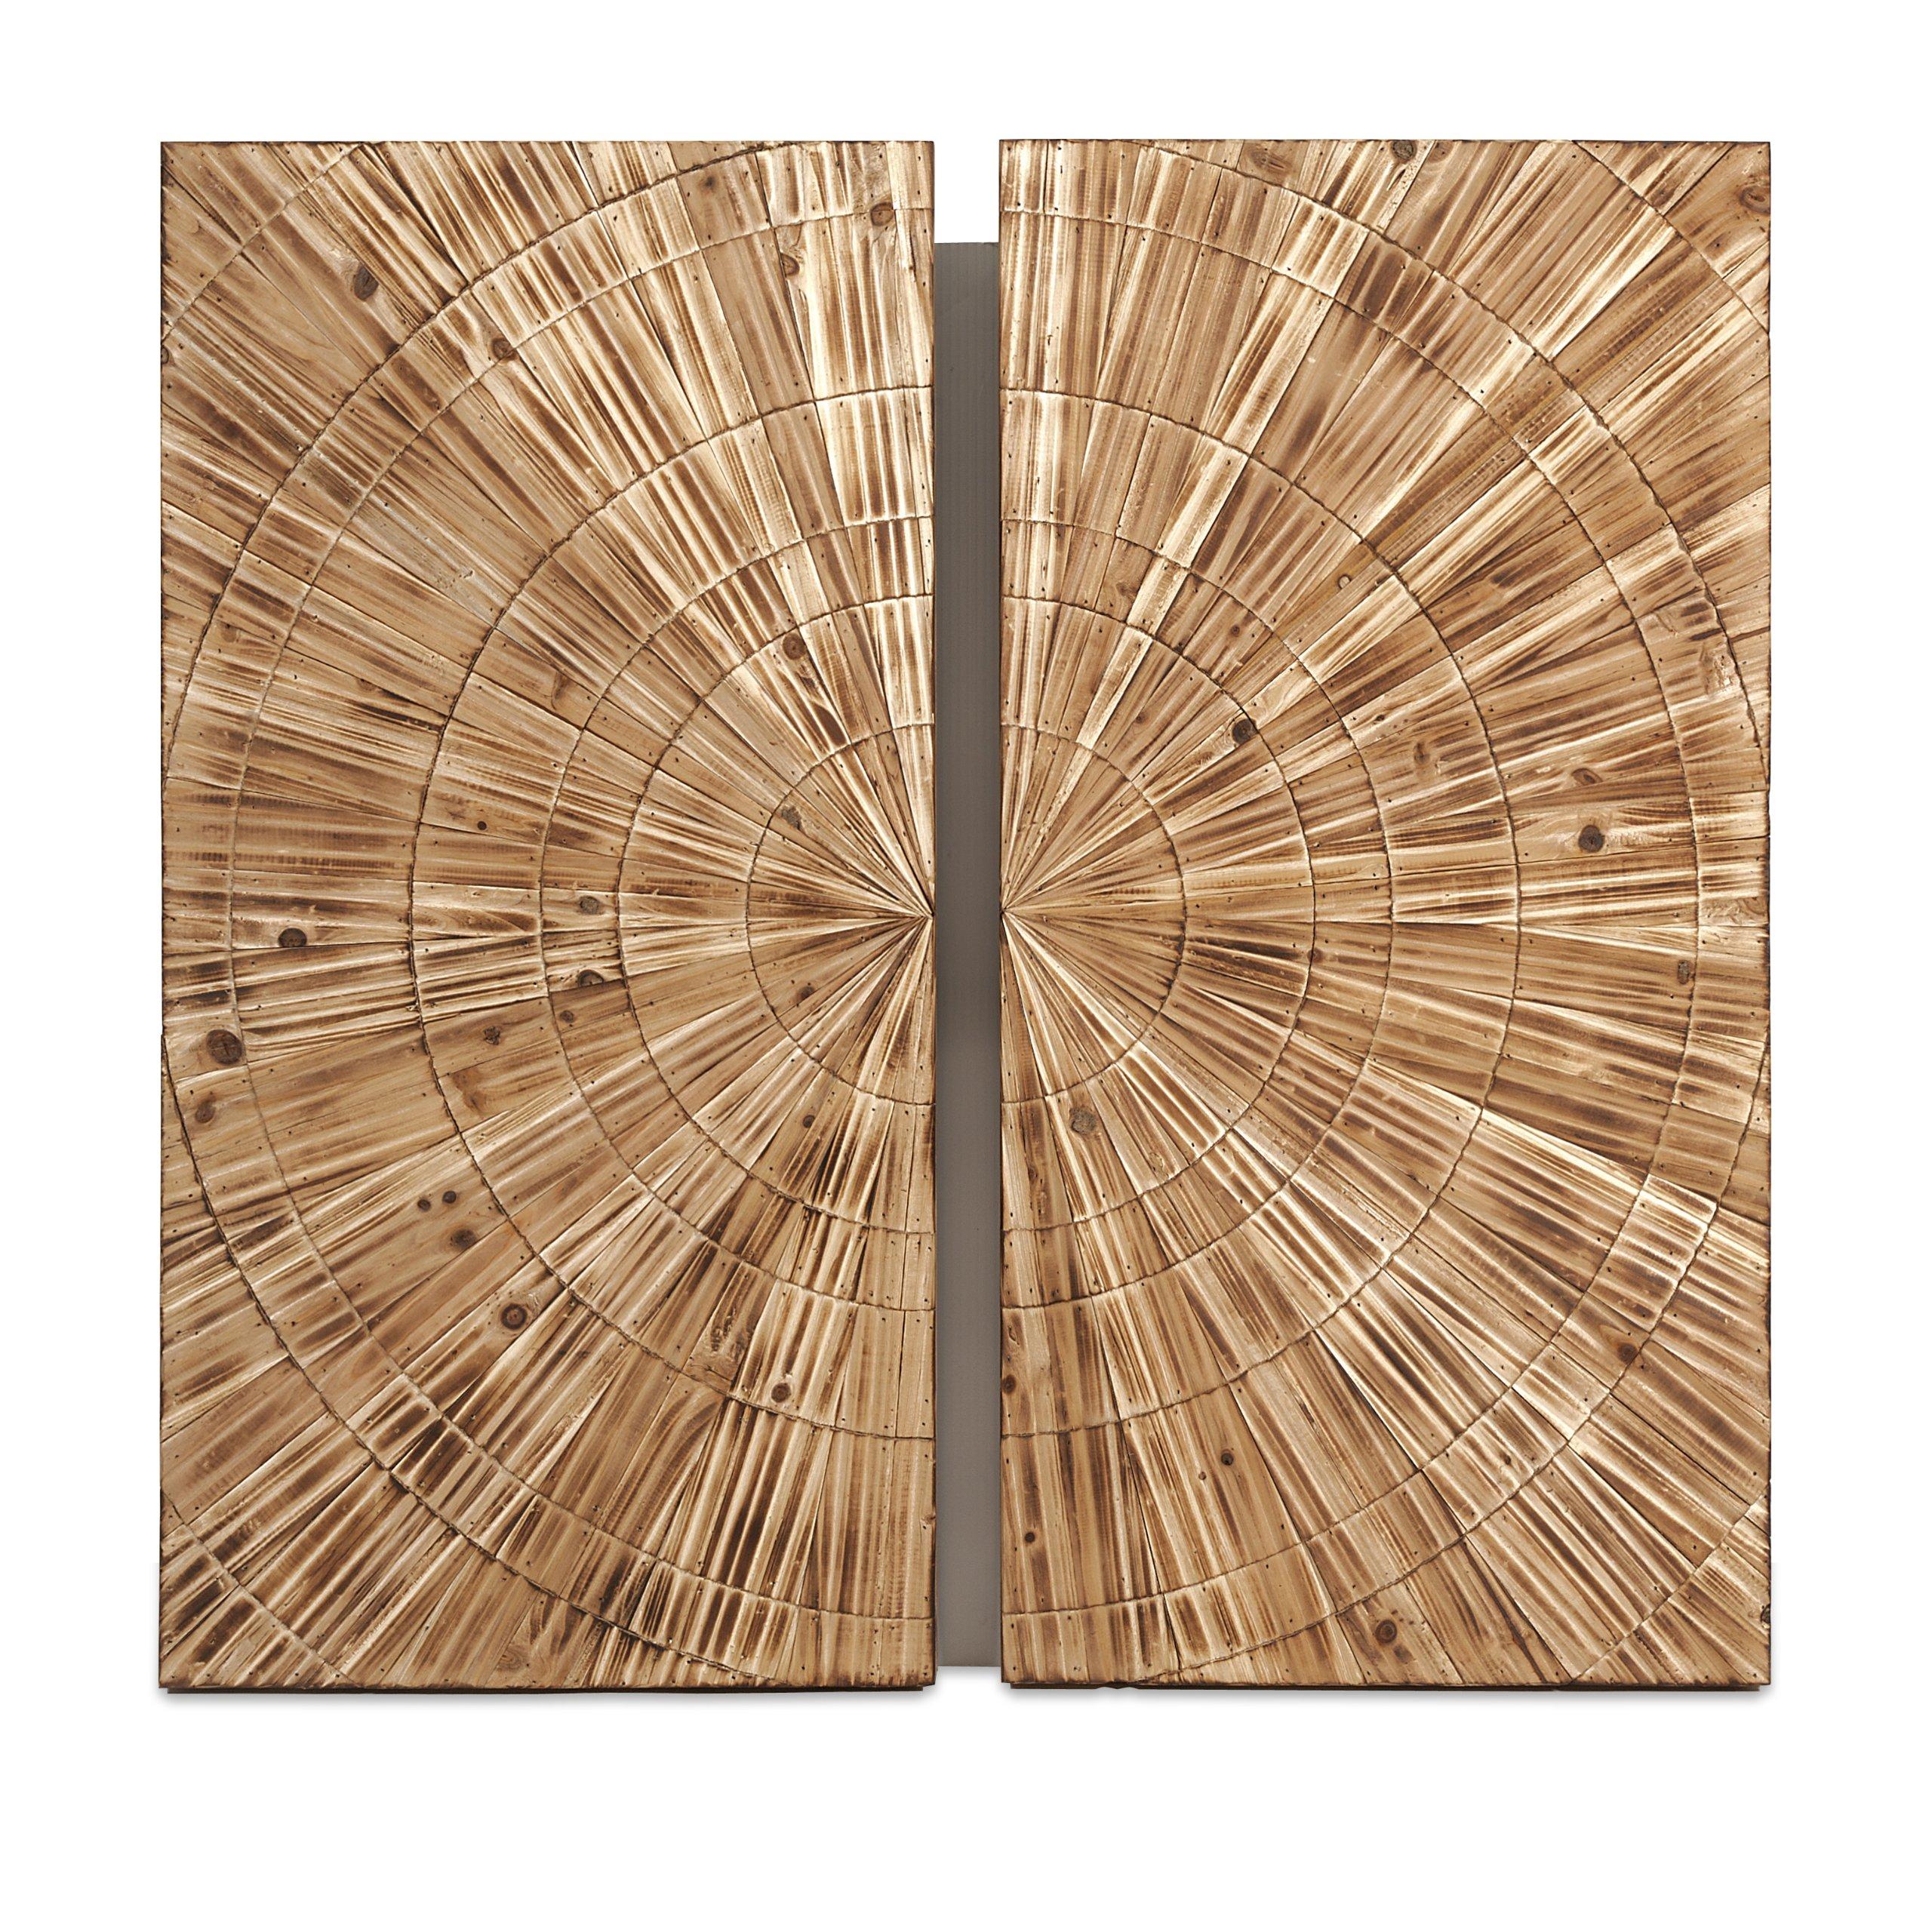 IMAX 74298 Boyd Carved Wood Wall Decor